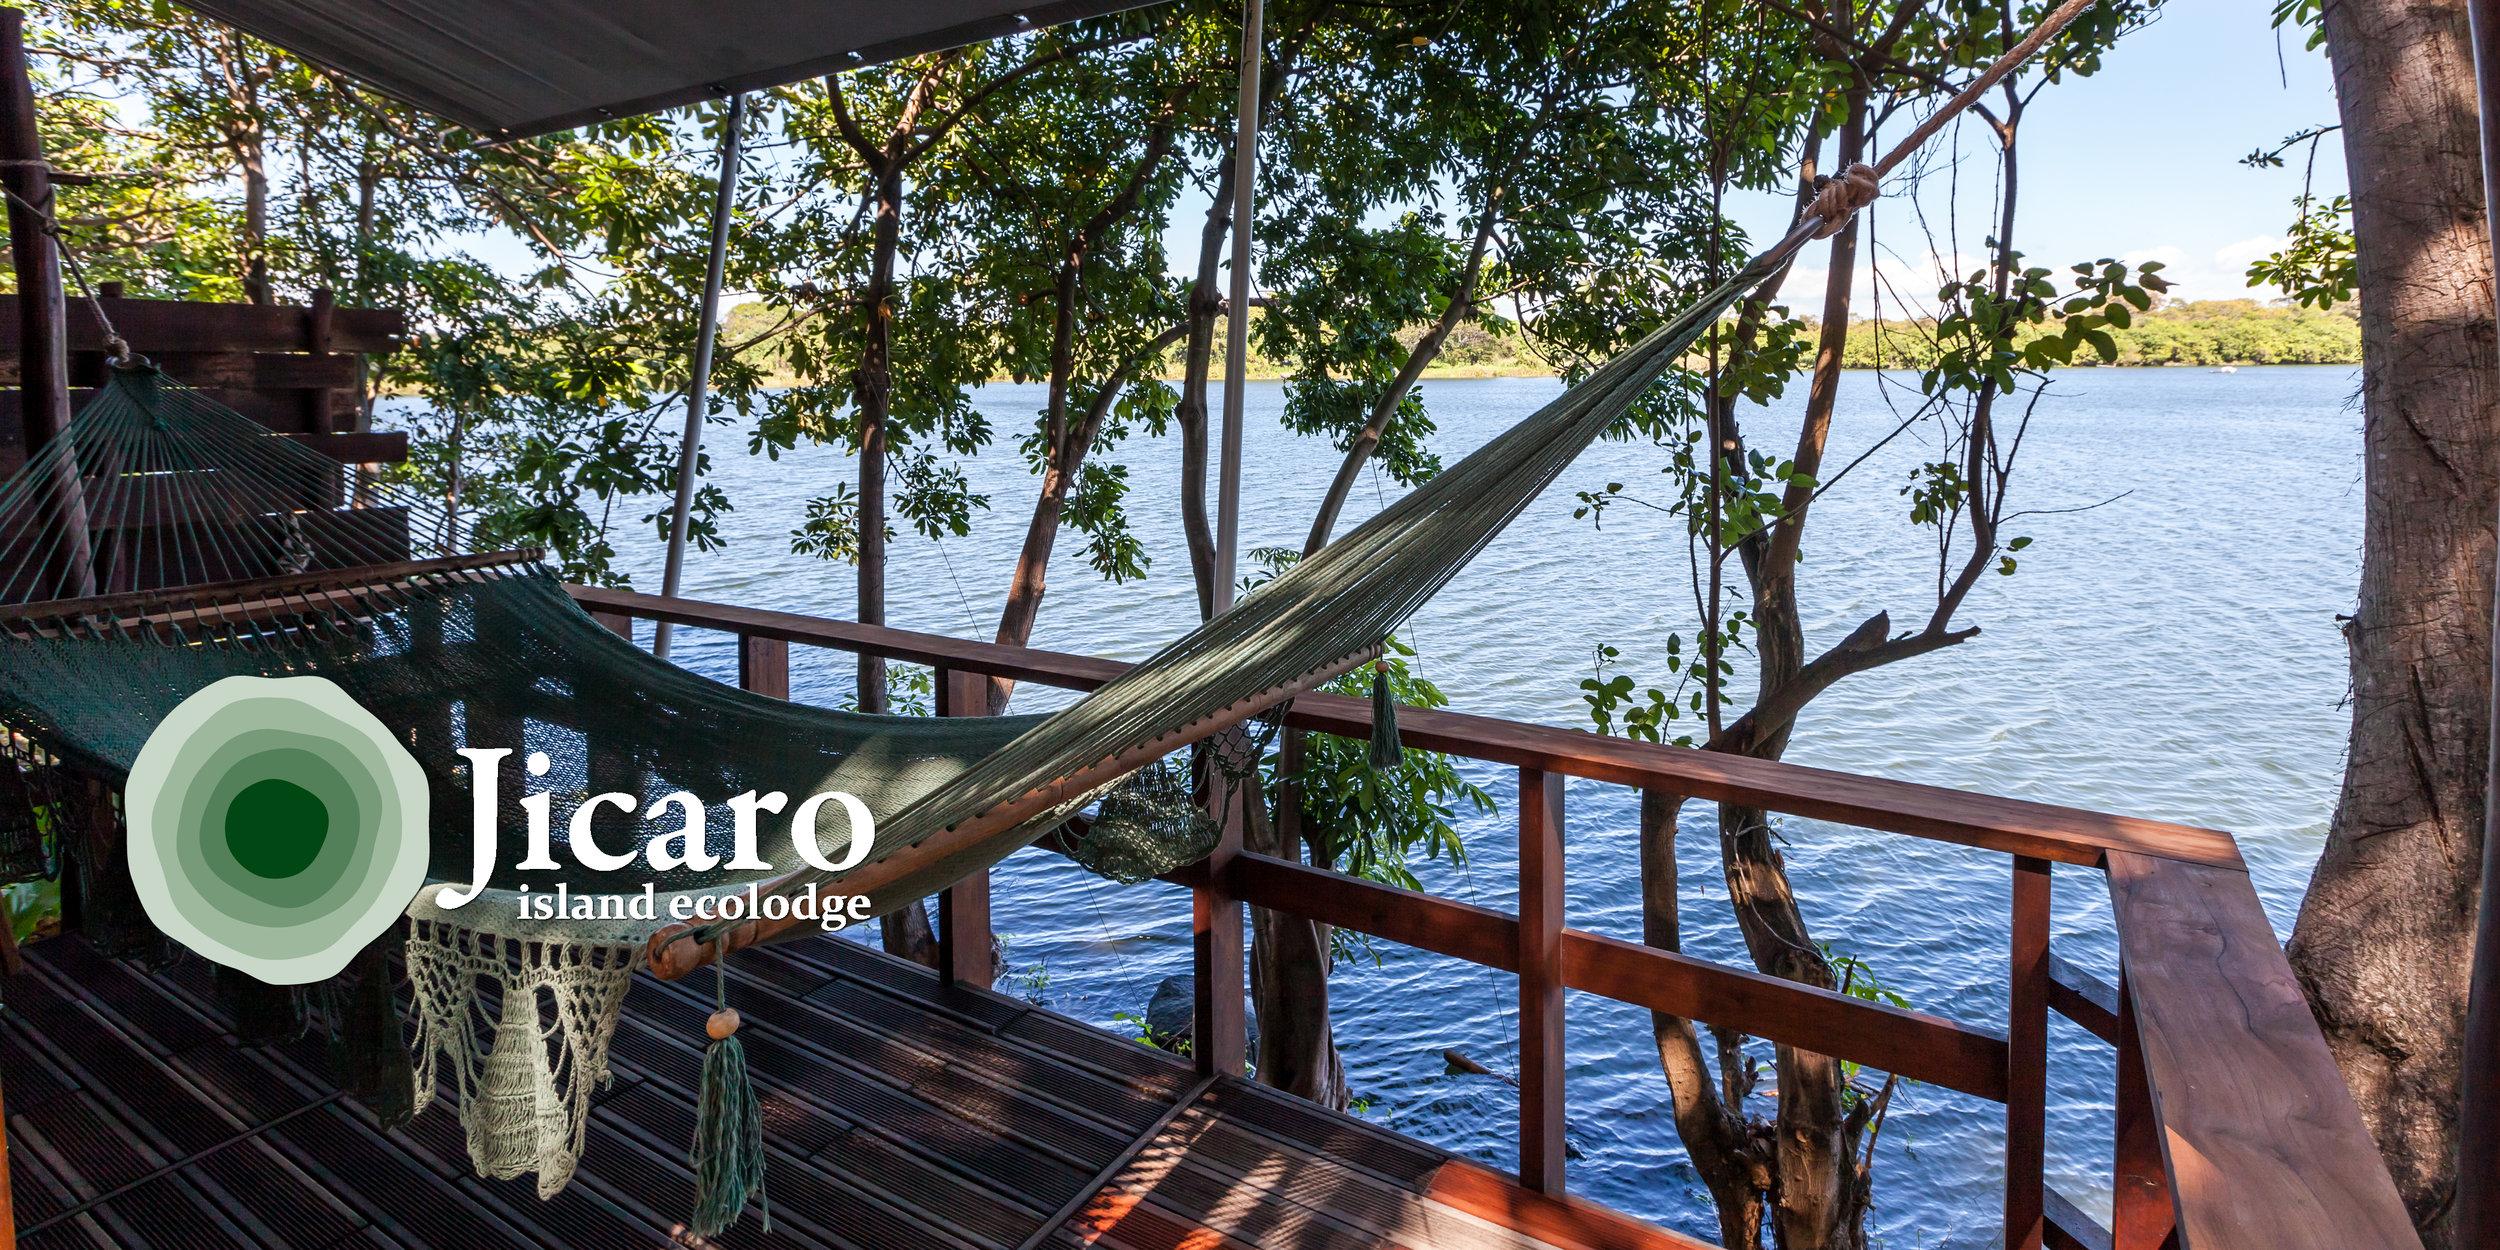 Jicaro Island Web Images 2.jpg